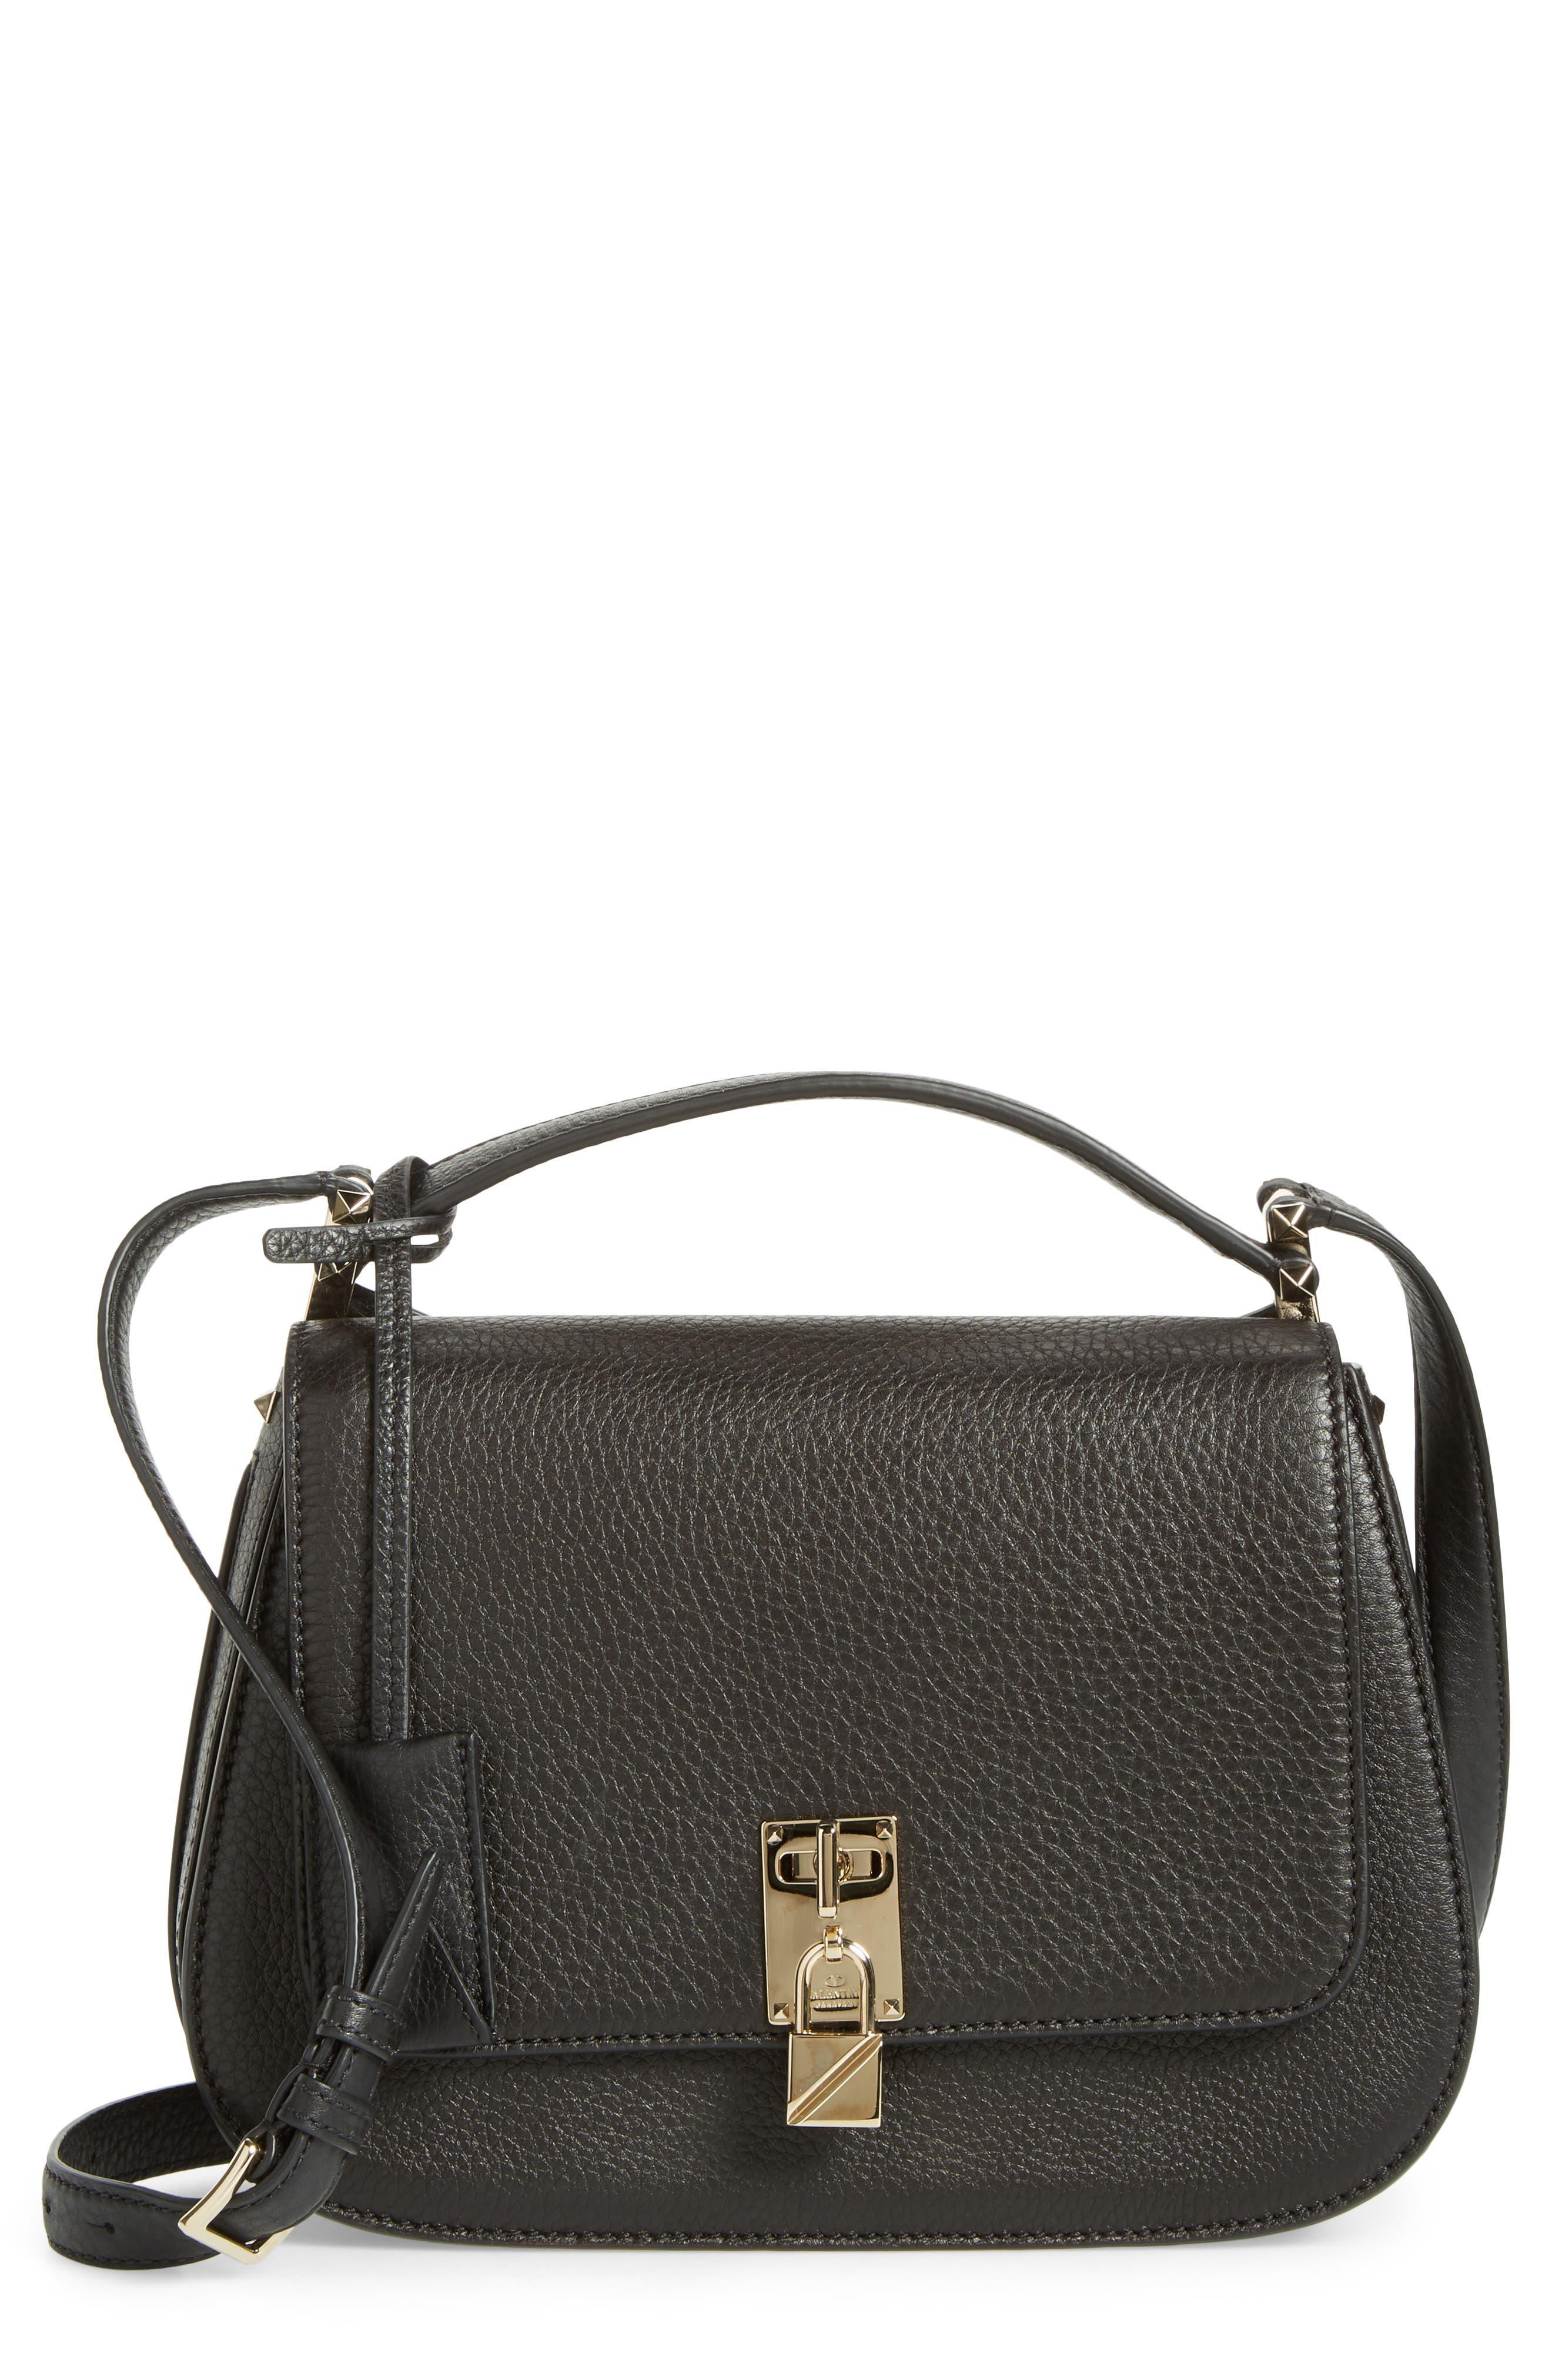 VALENTINO GARAVANI Pieper Calfskin Crossbody Bag